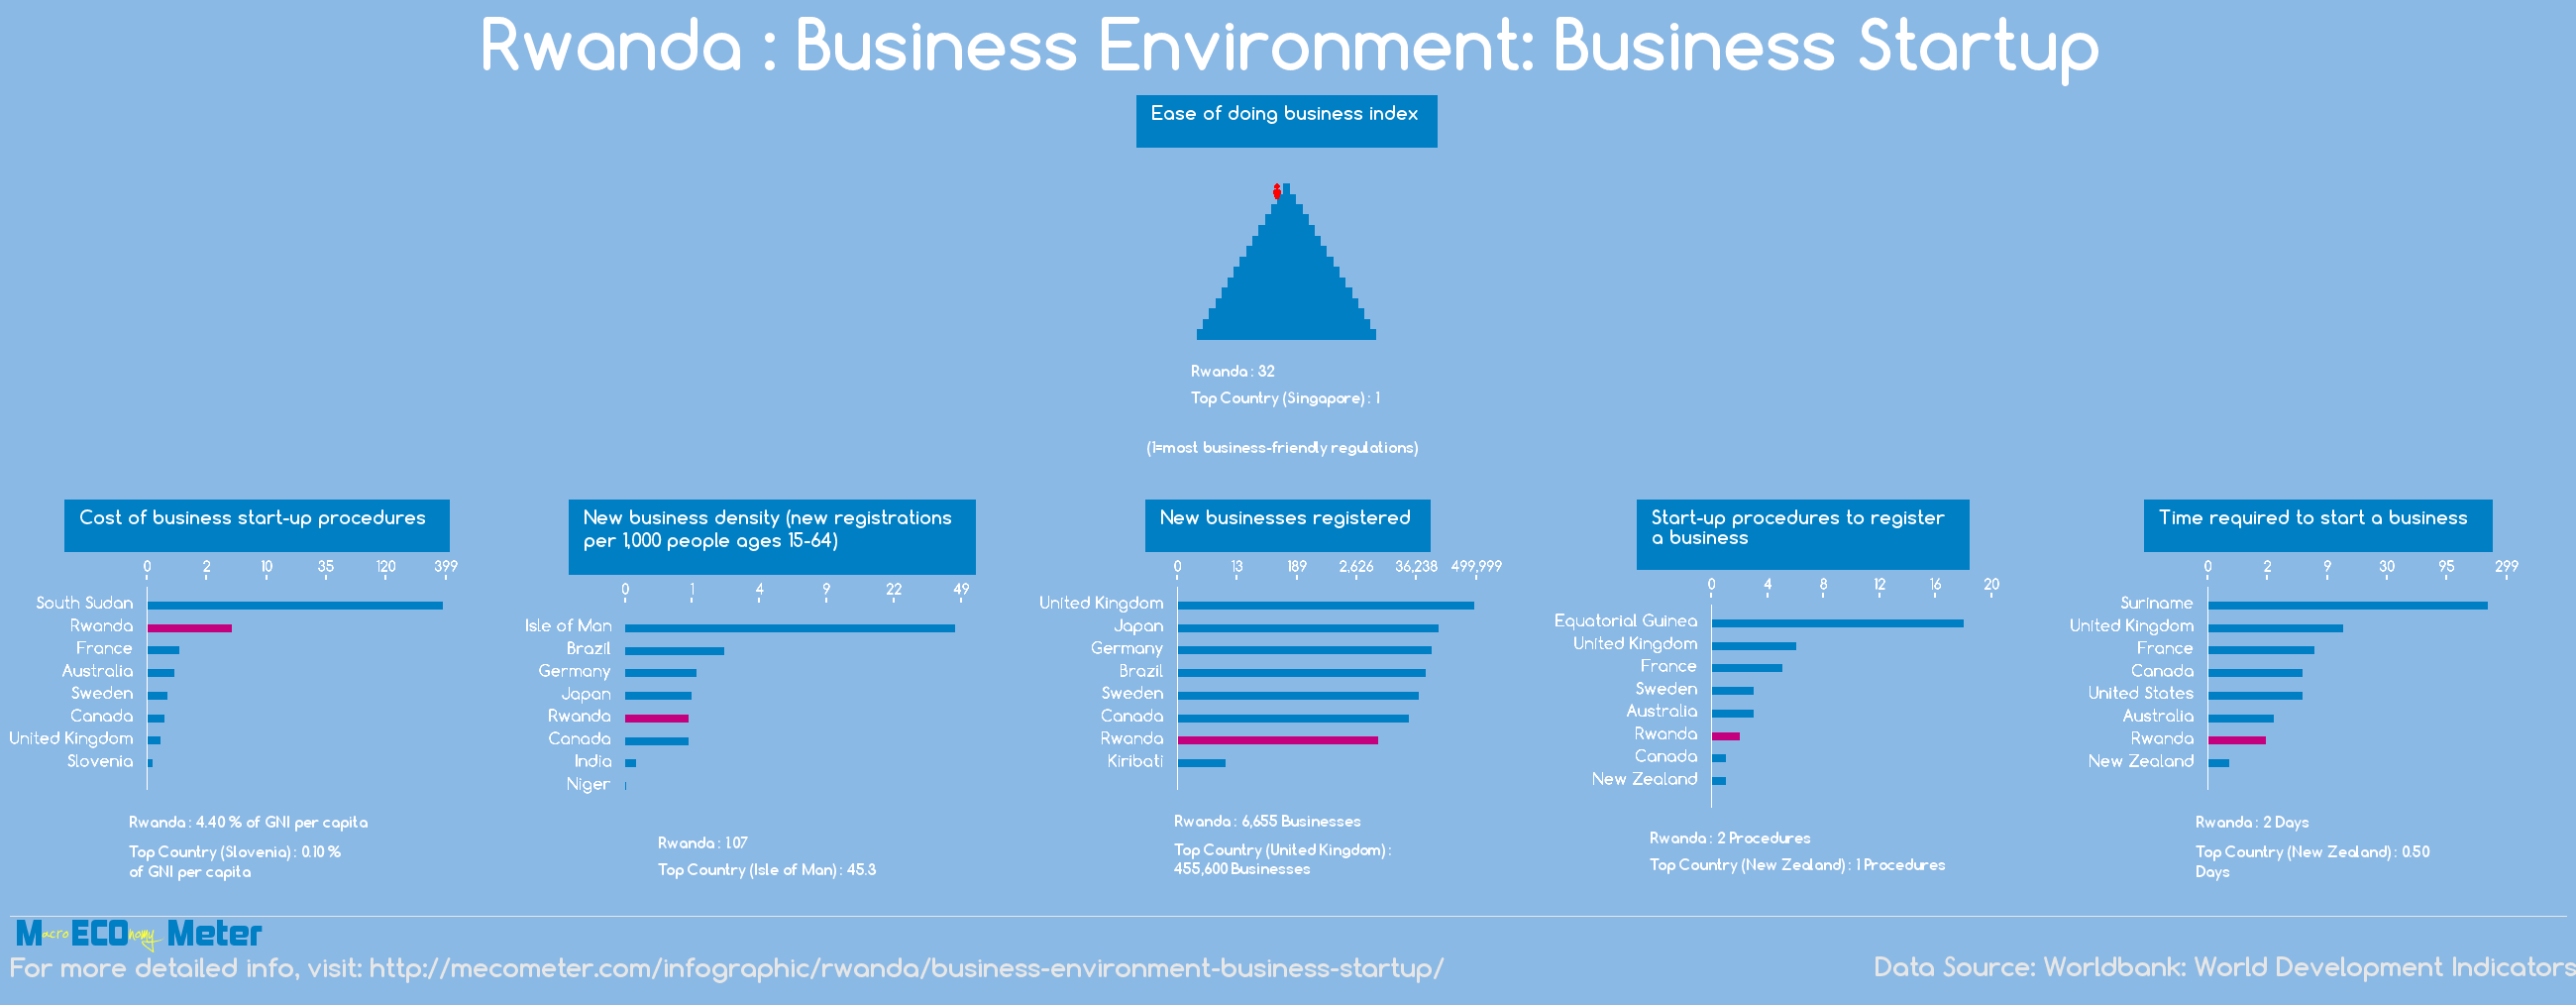 Rwanda : Business Environment: Business Startup